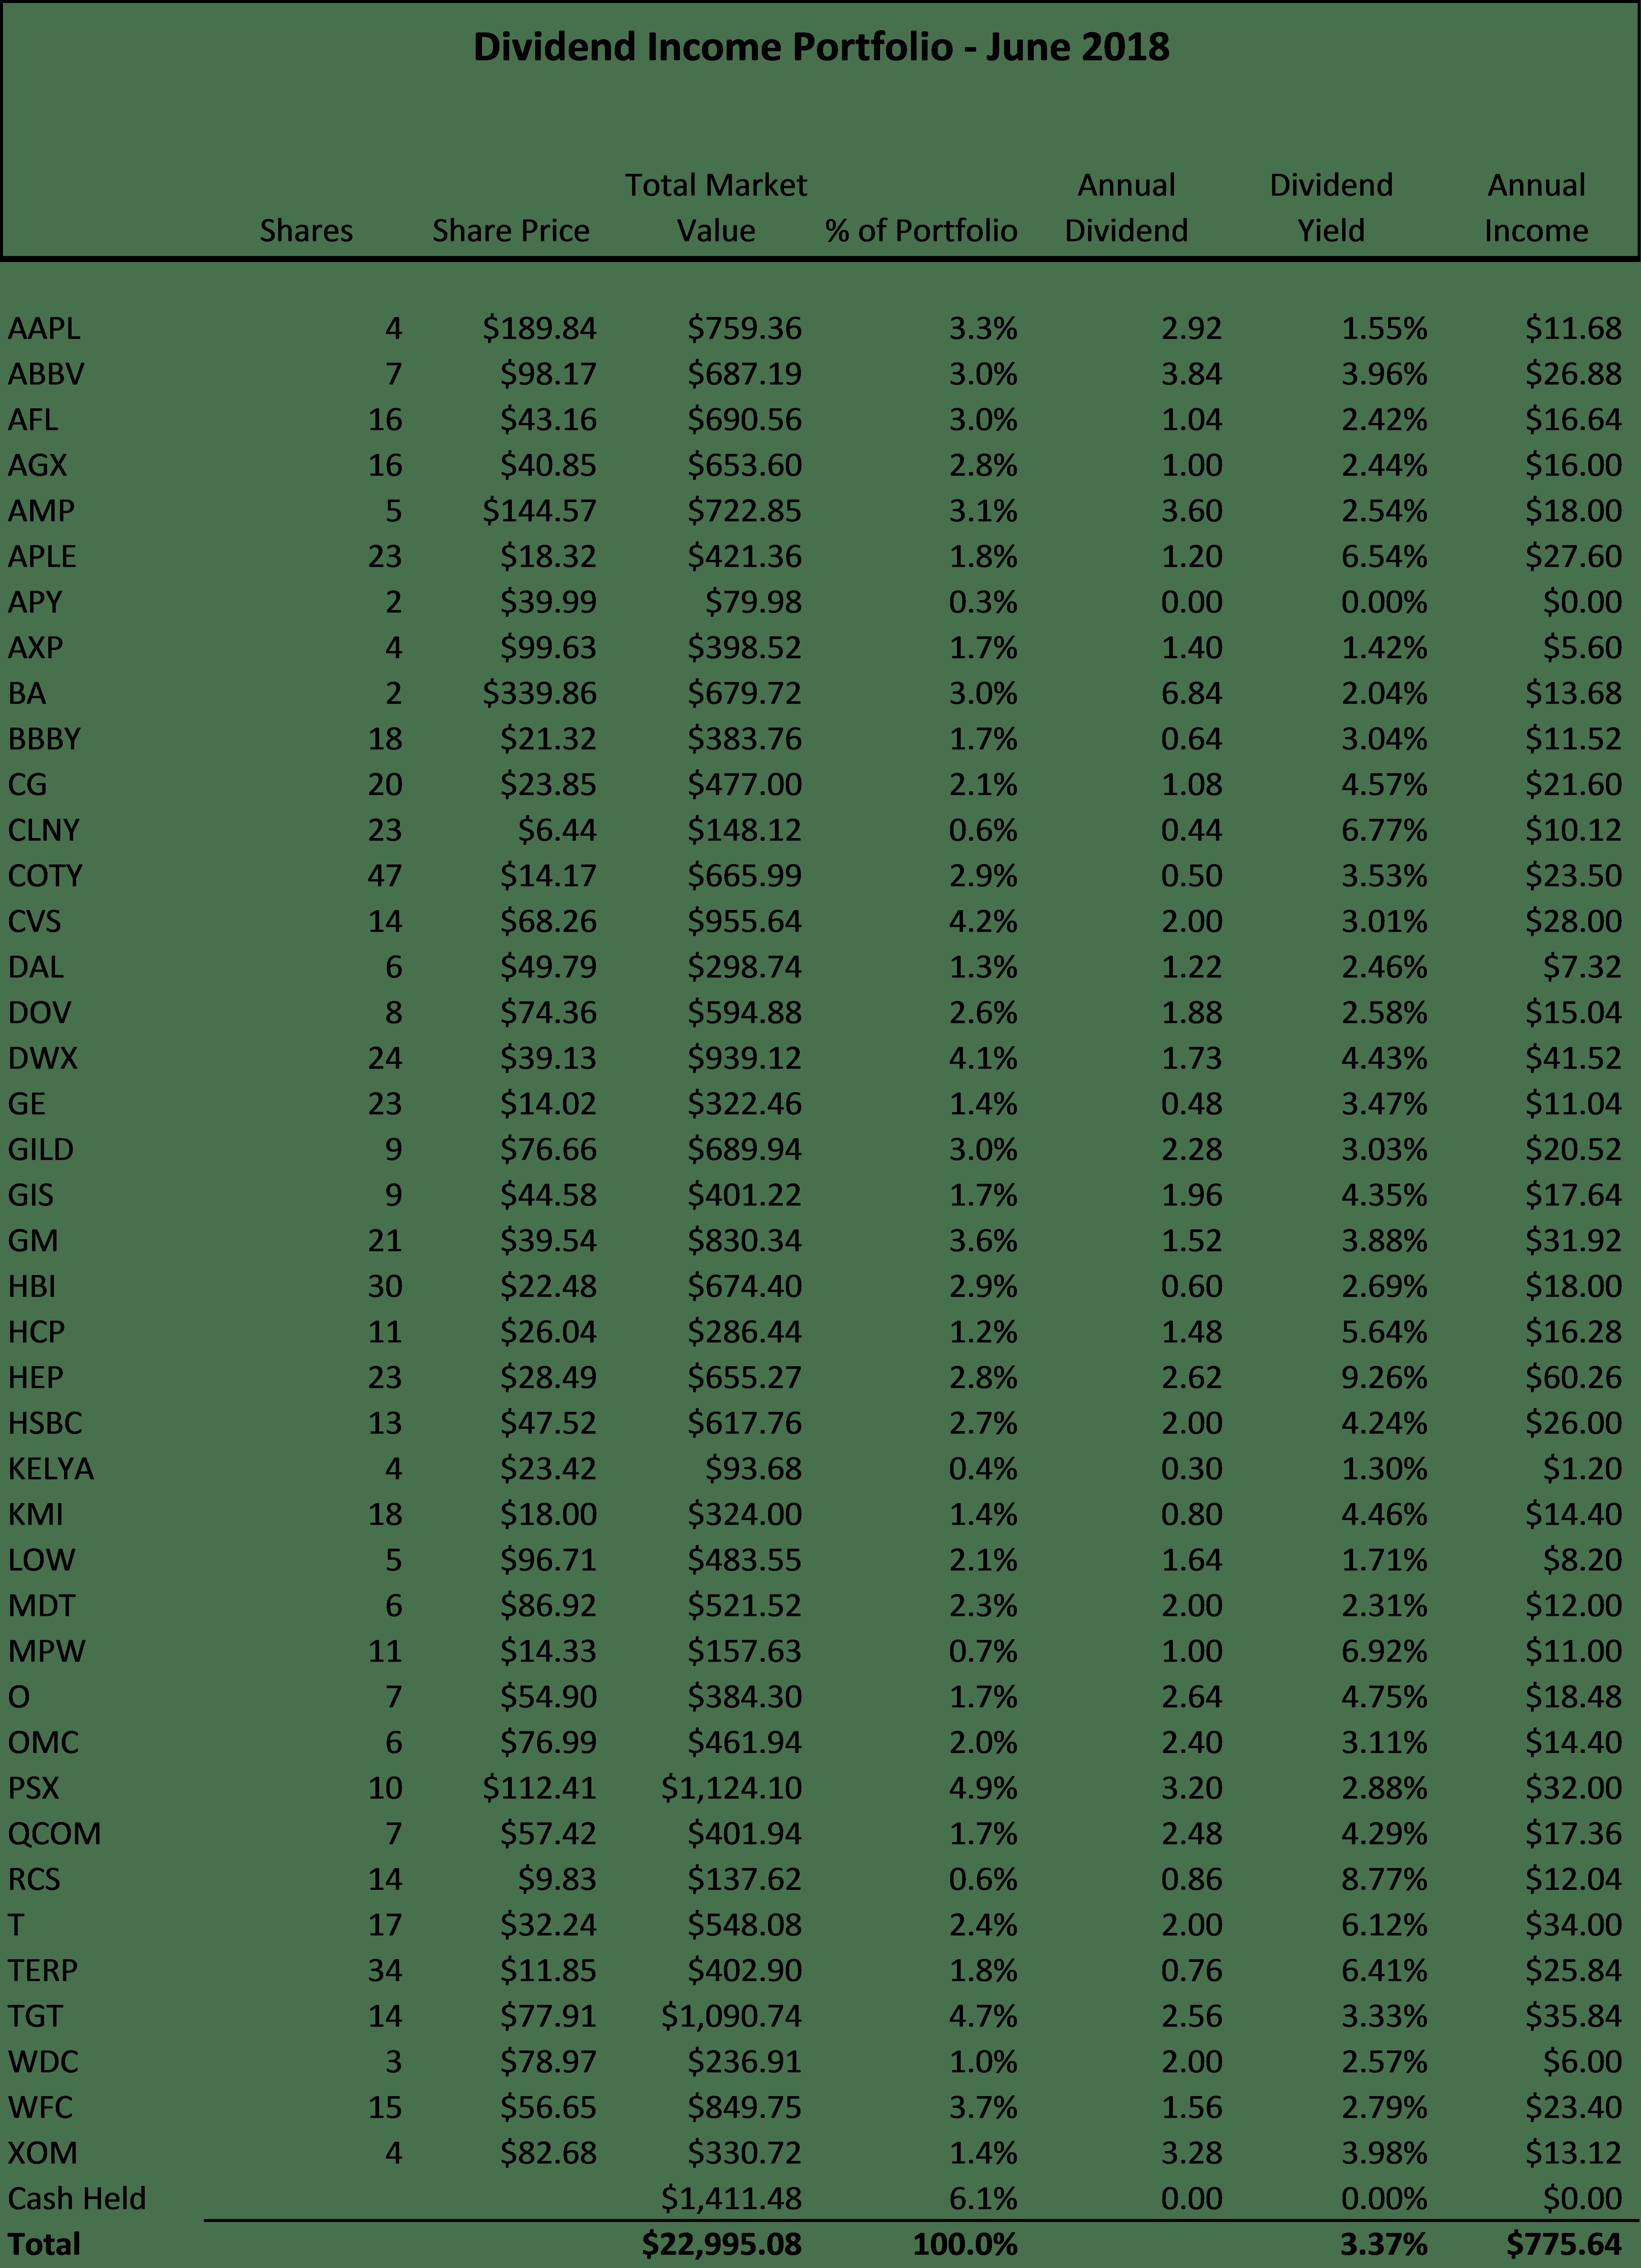 Robinhood Dividend Income Portfolio Update - June 2018